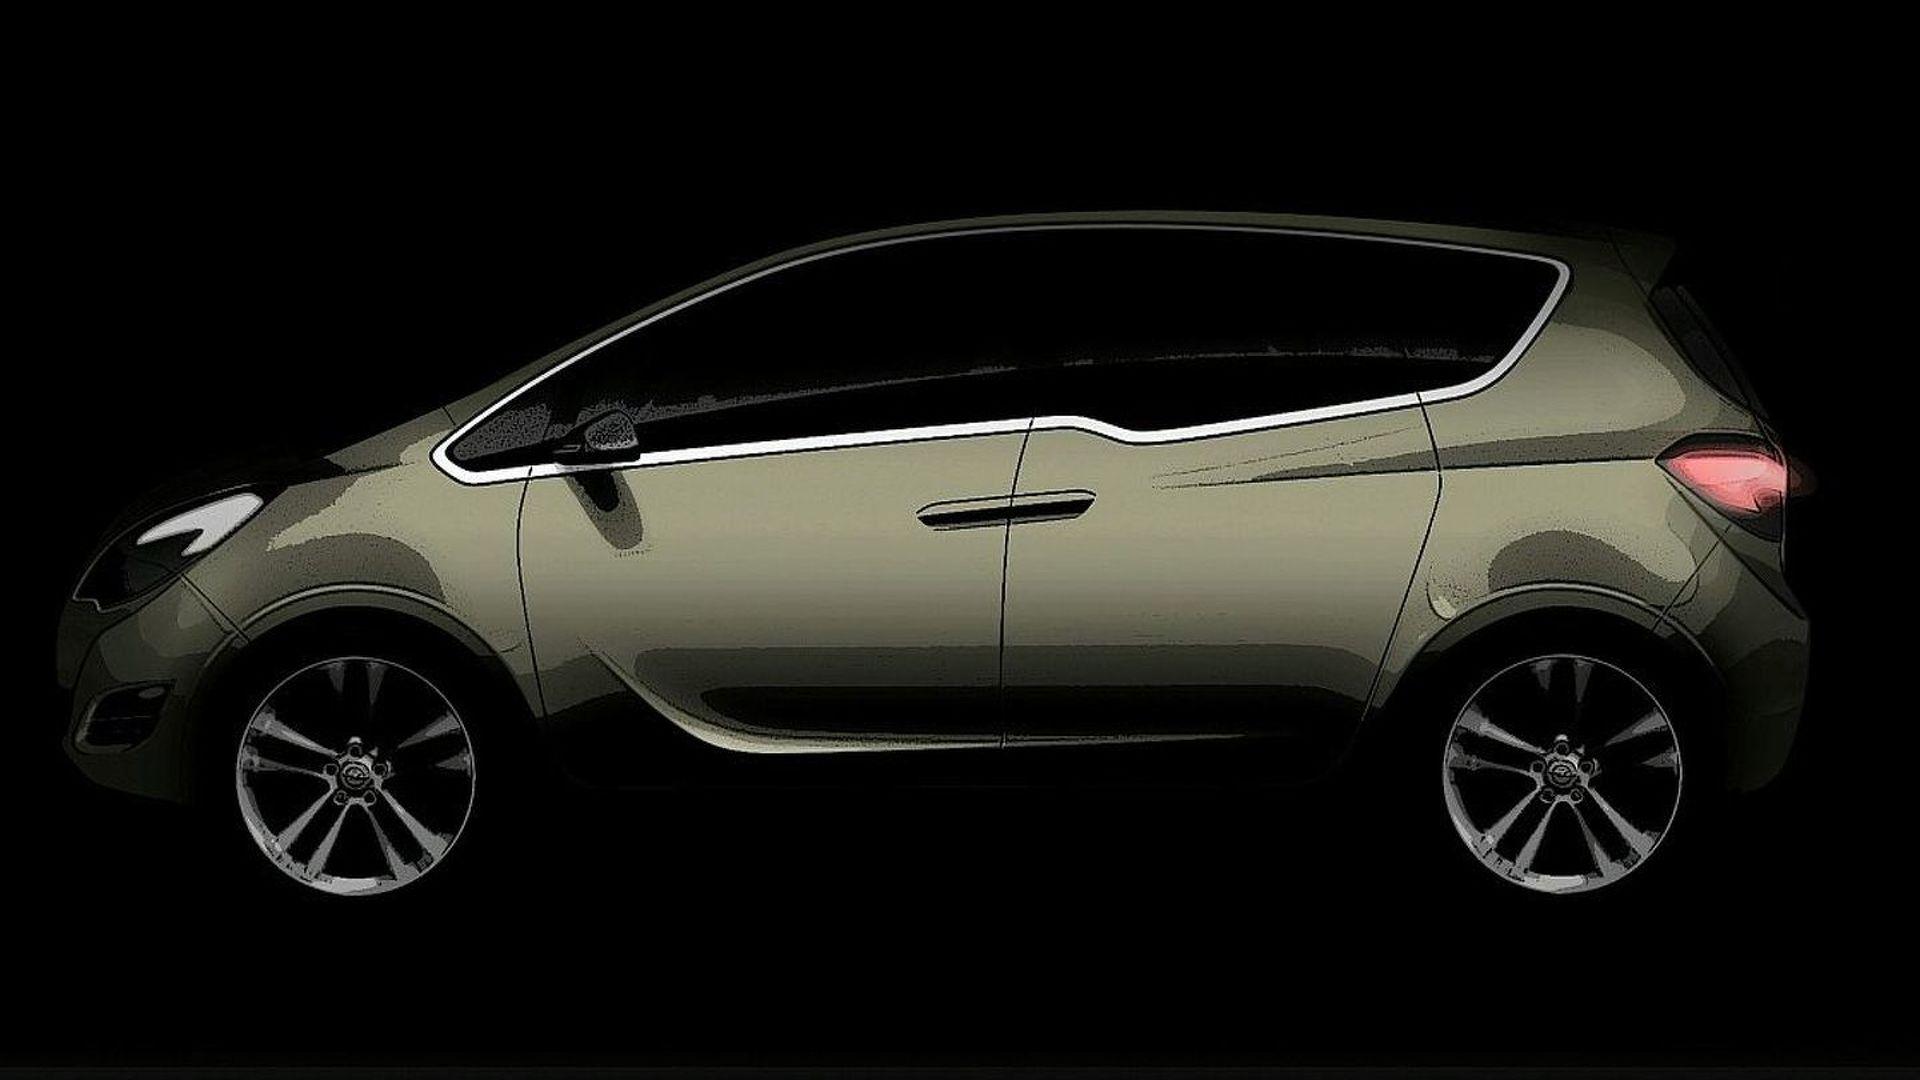 OFFICAL INFO: Opel Meriva Concept - World premiere: FlexDoors